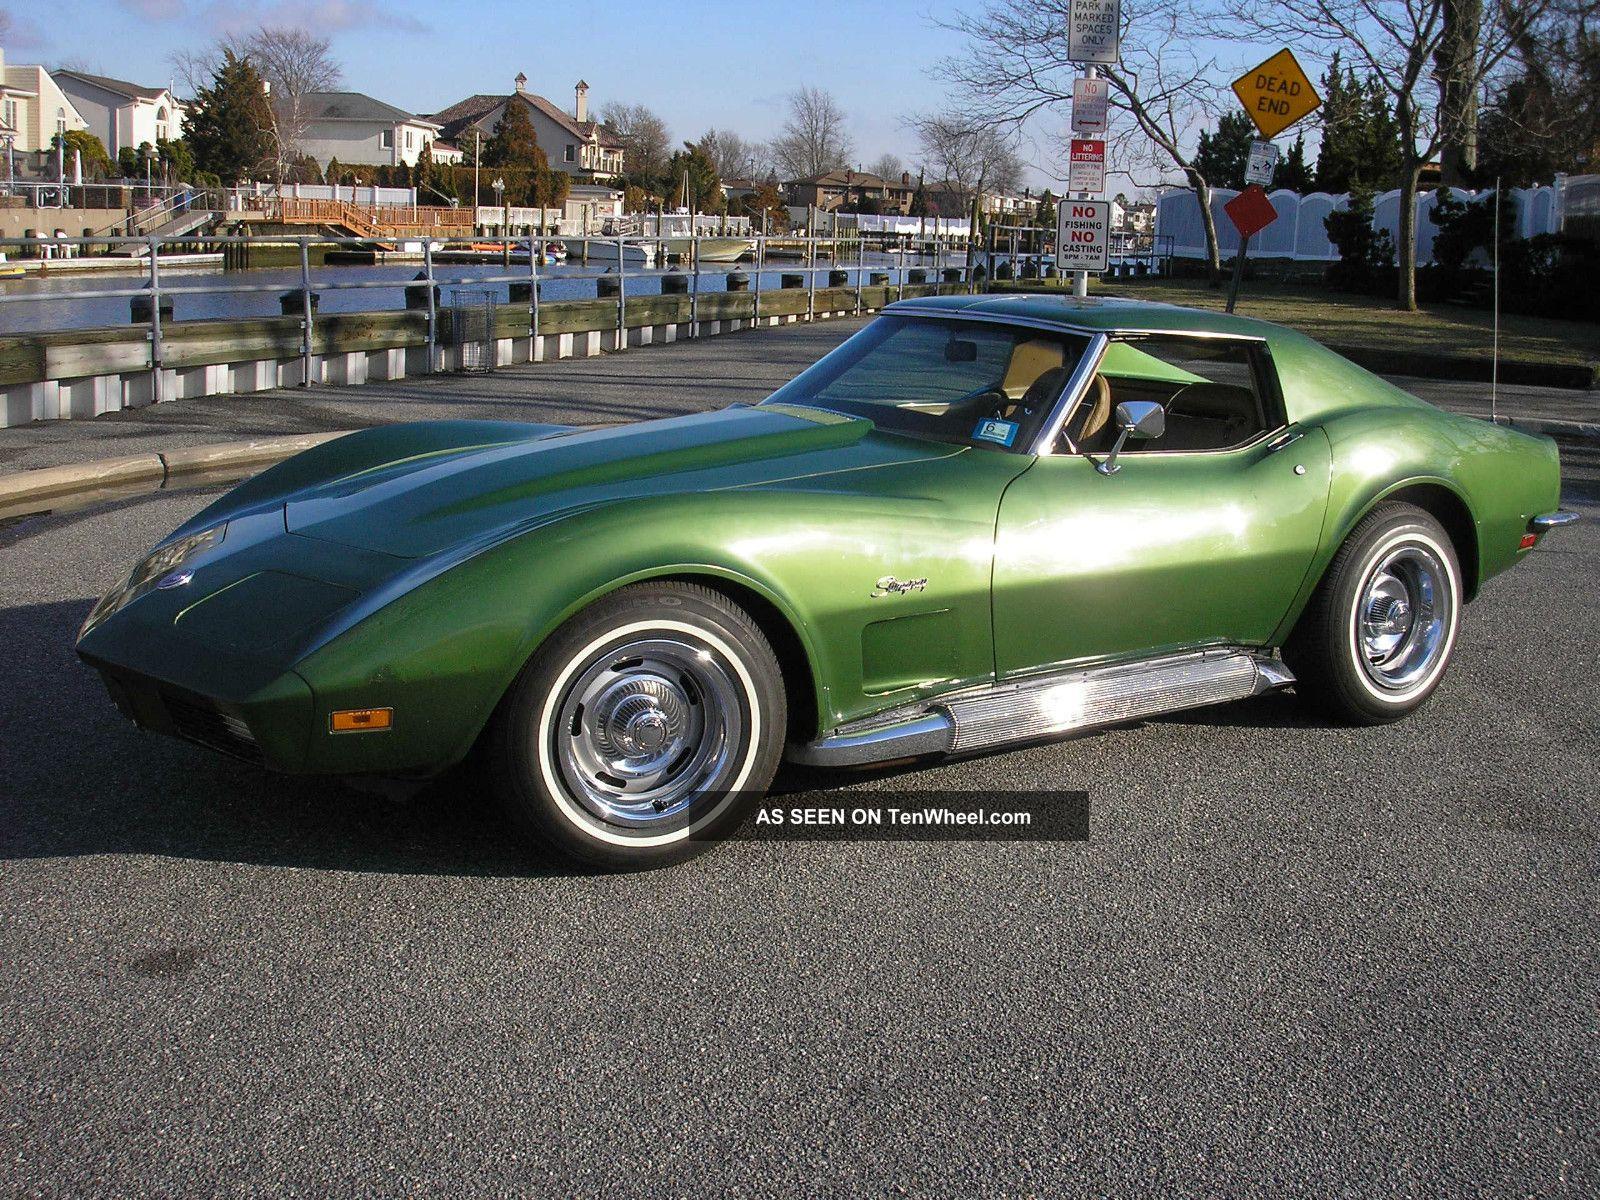 2013 Chevy Malibu Owners Manual >> 1973 Corvette L - 82 ' S Match 4spd Solid Orig 84k P / W A / C T&t Stingray